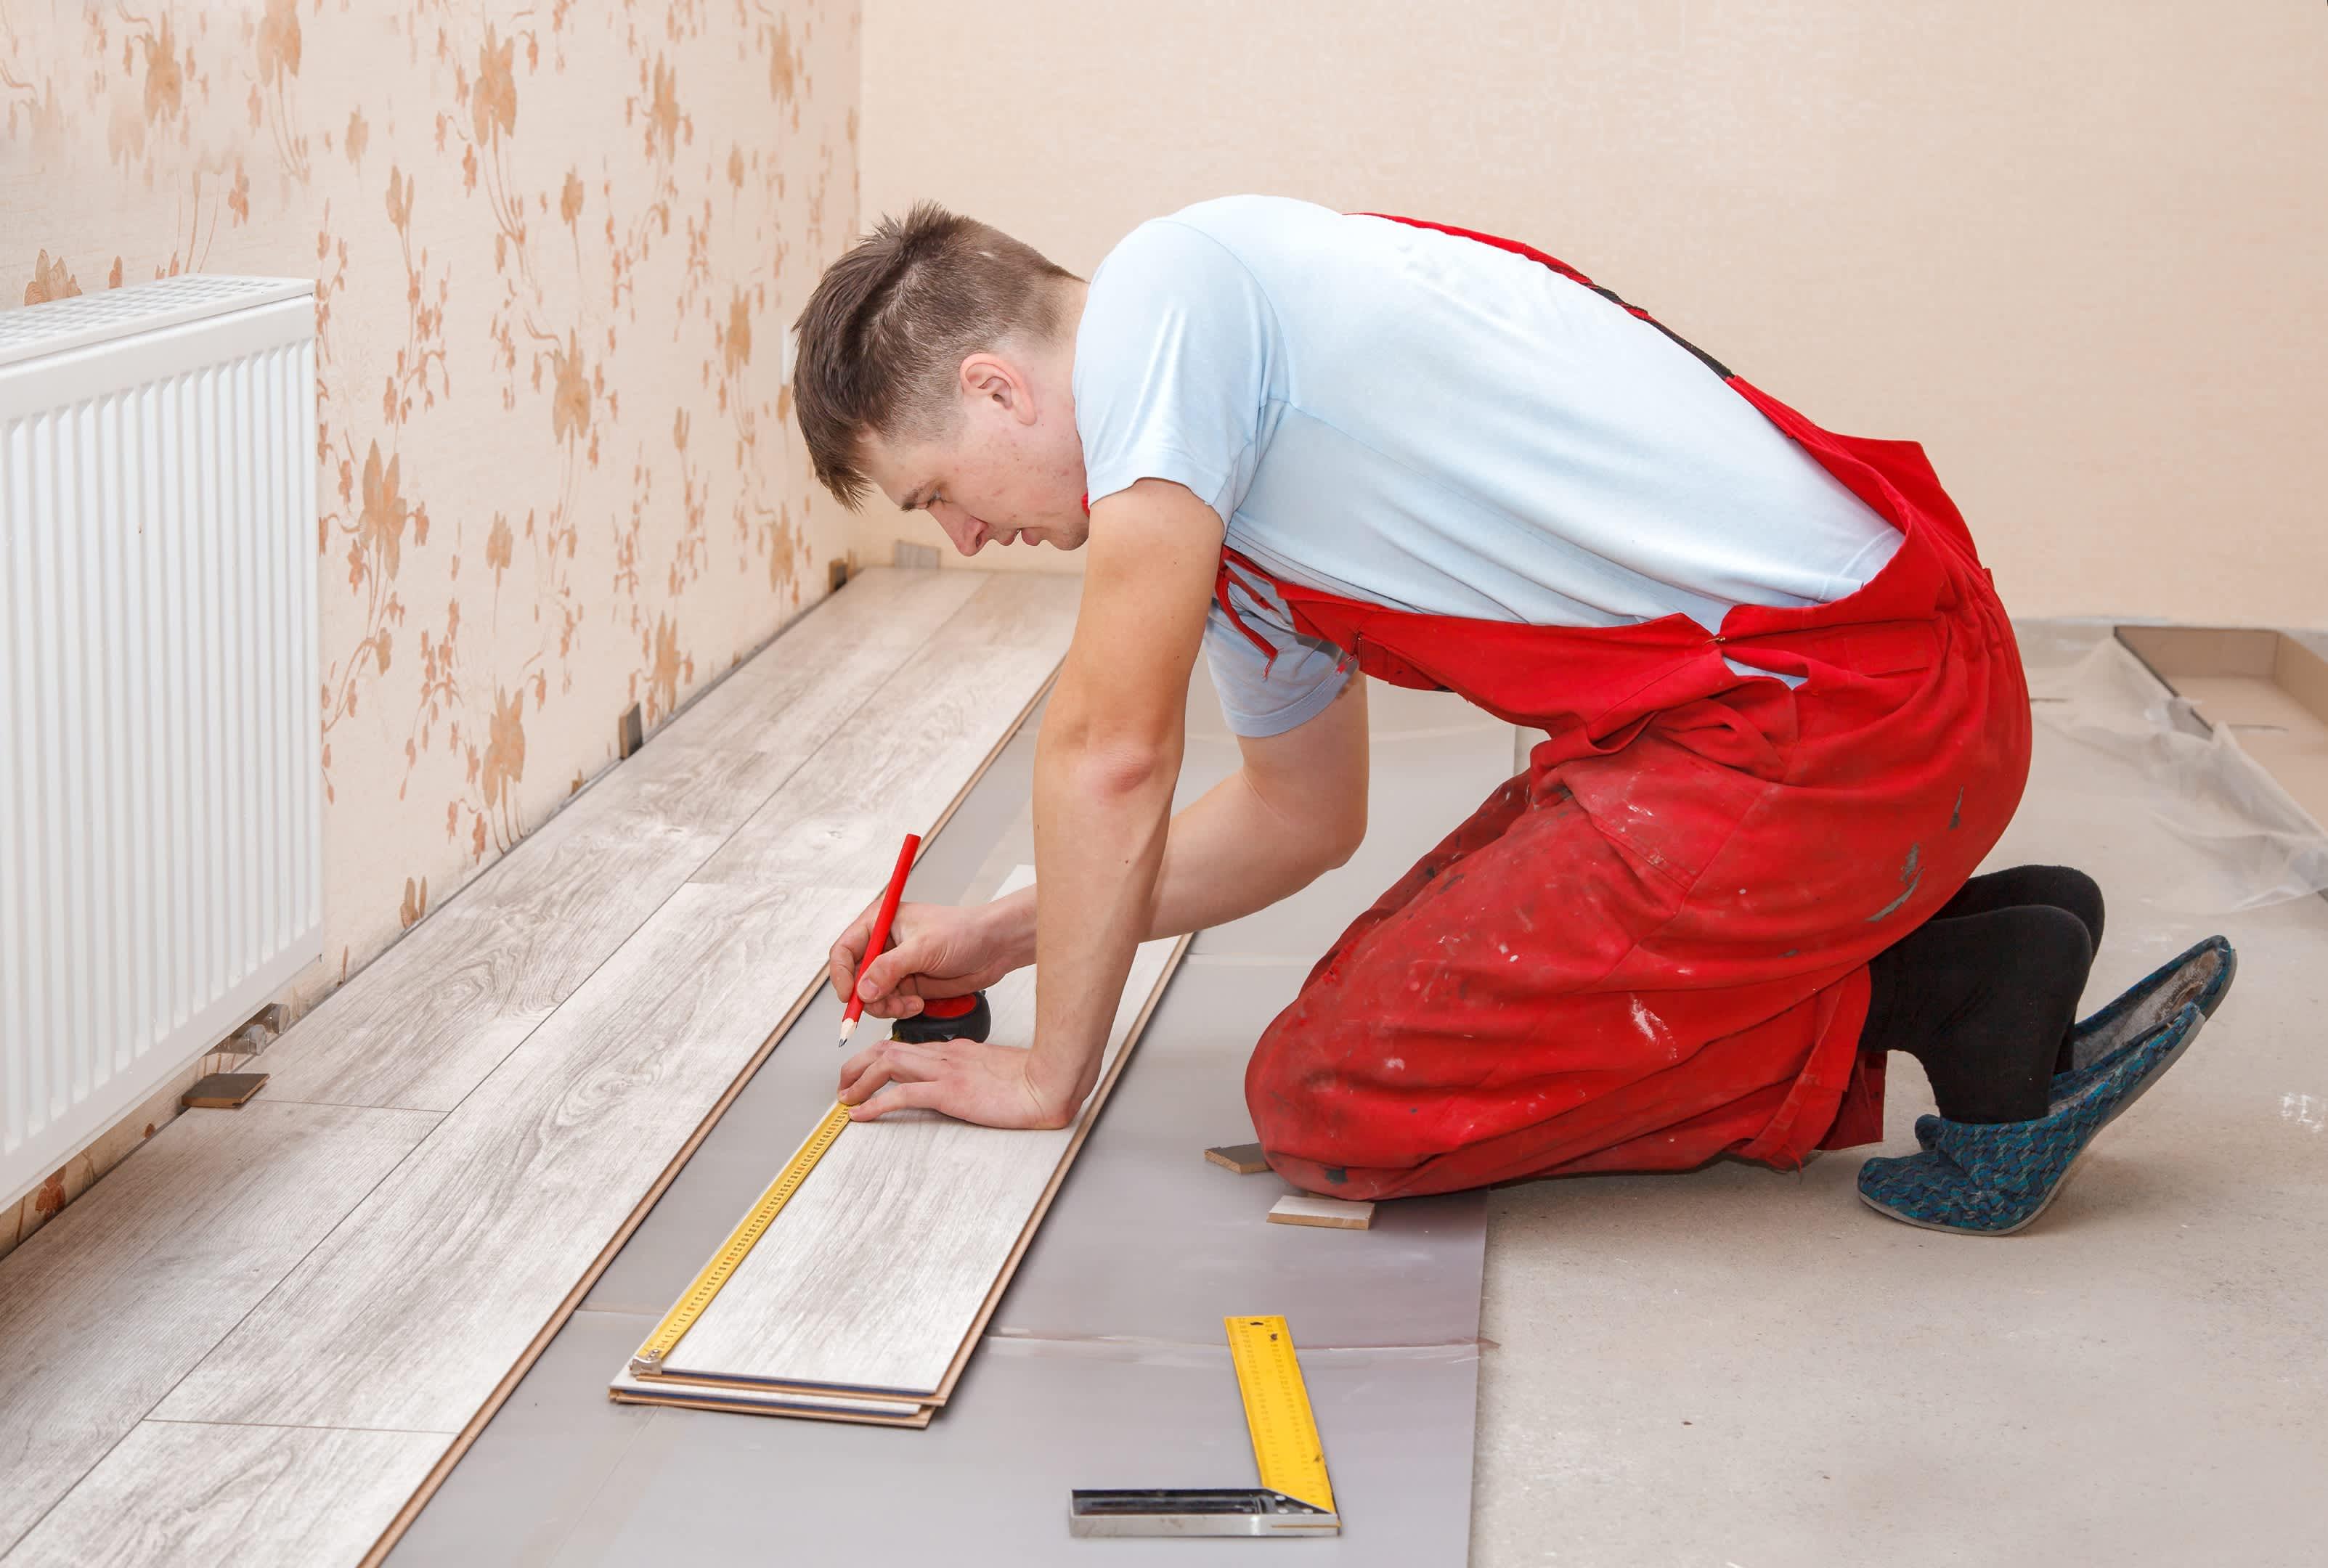 SMG Plumbing & Home Improvements